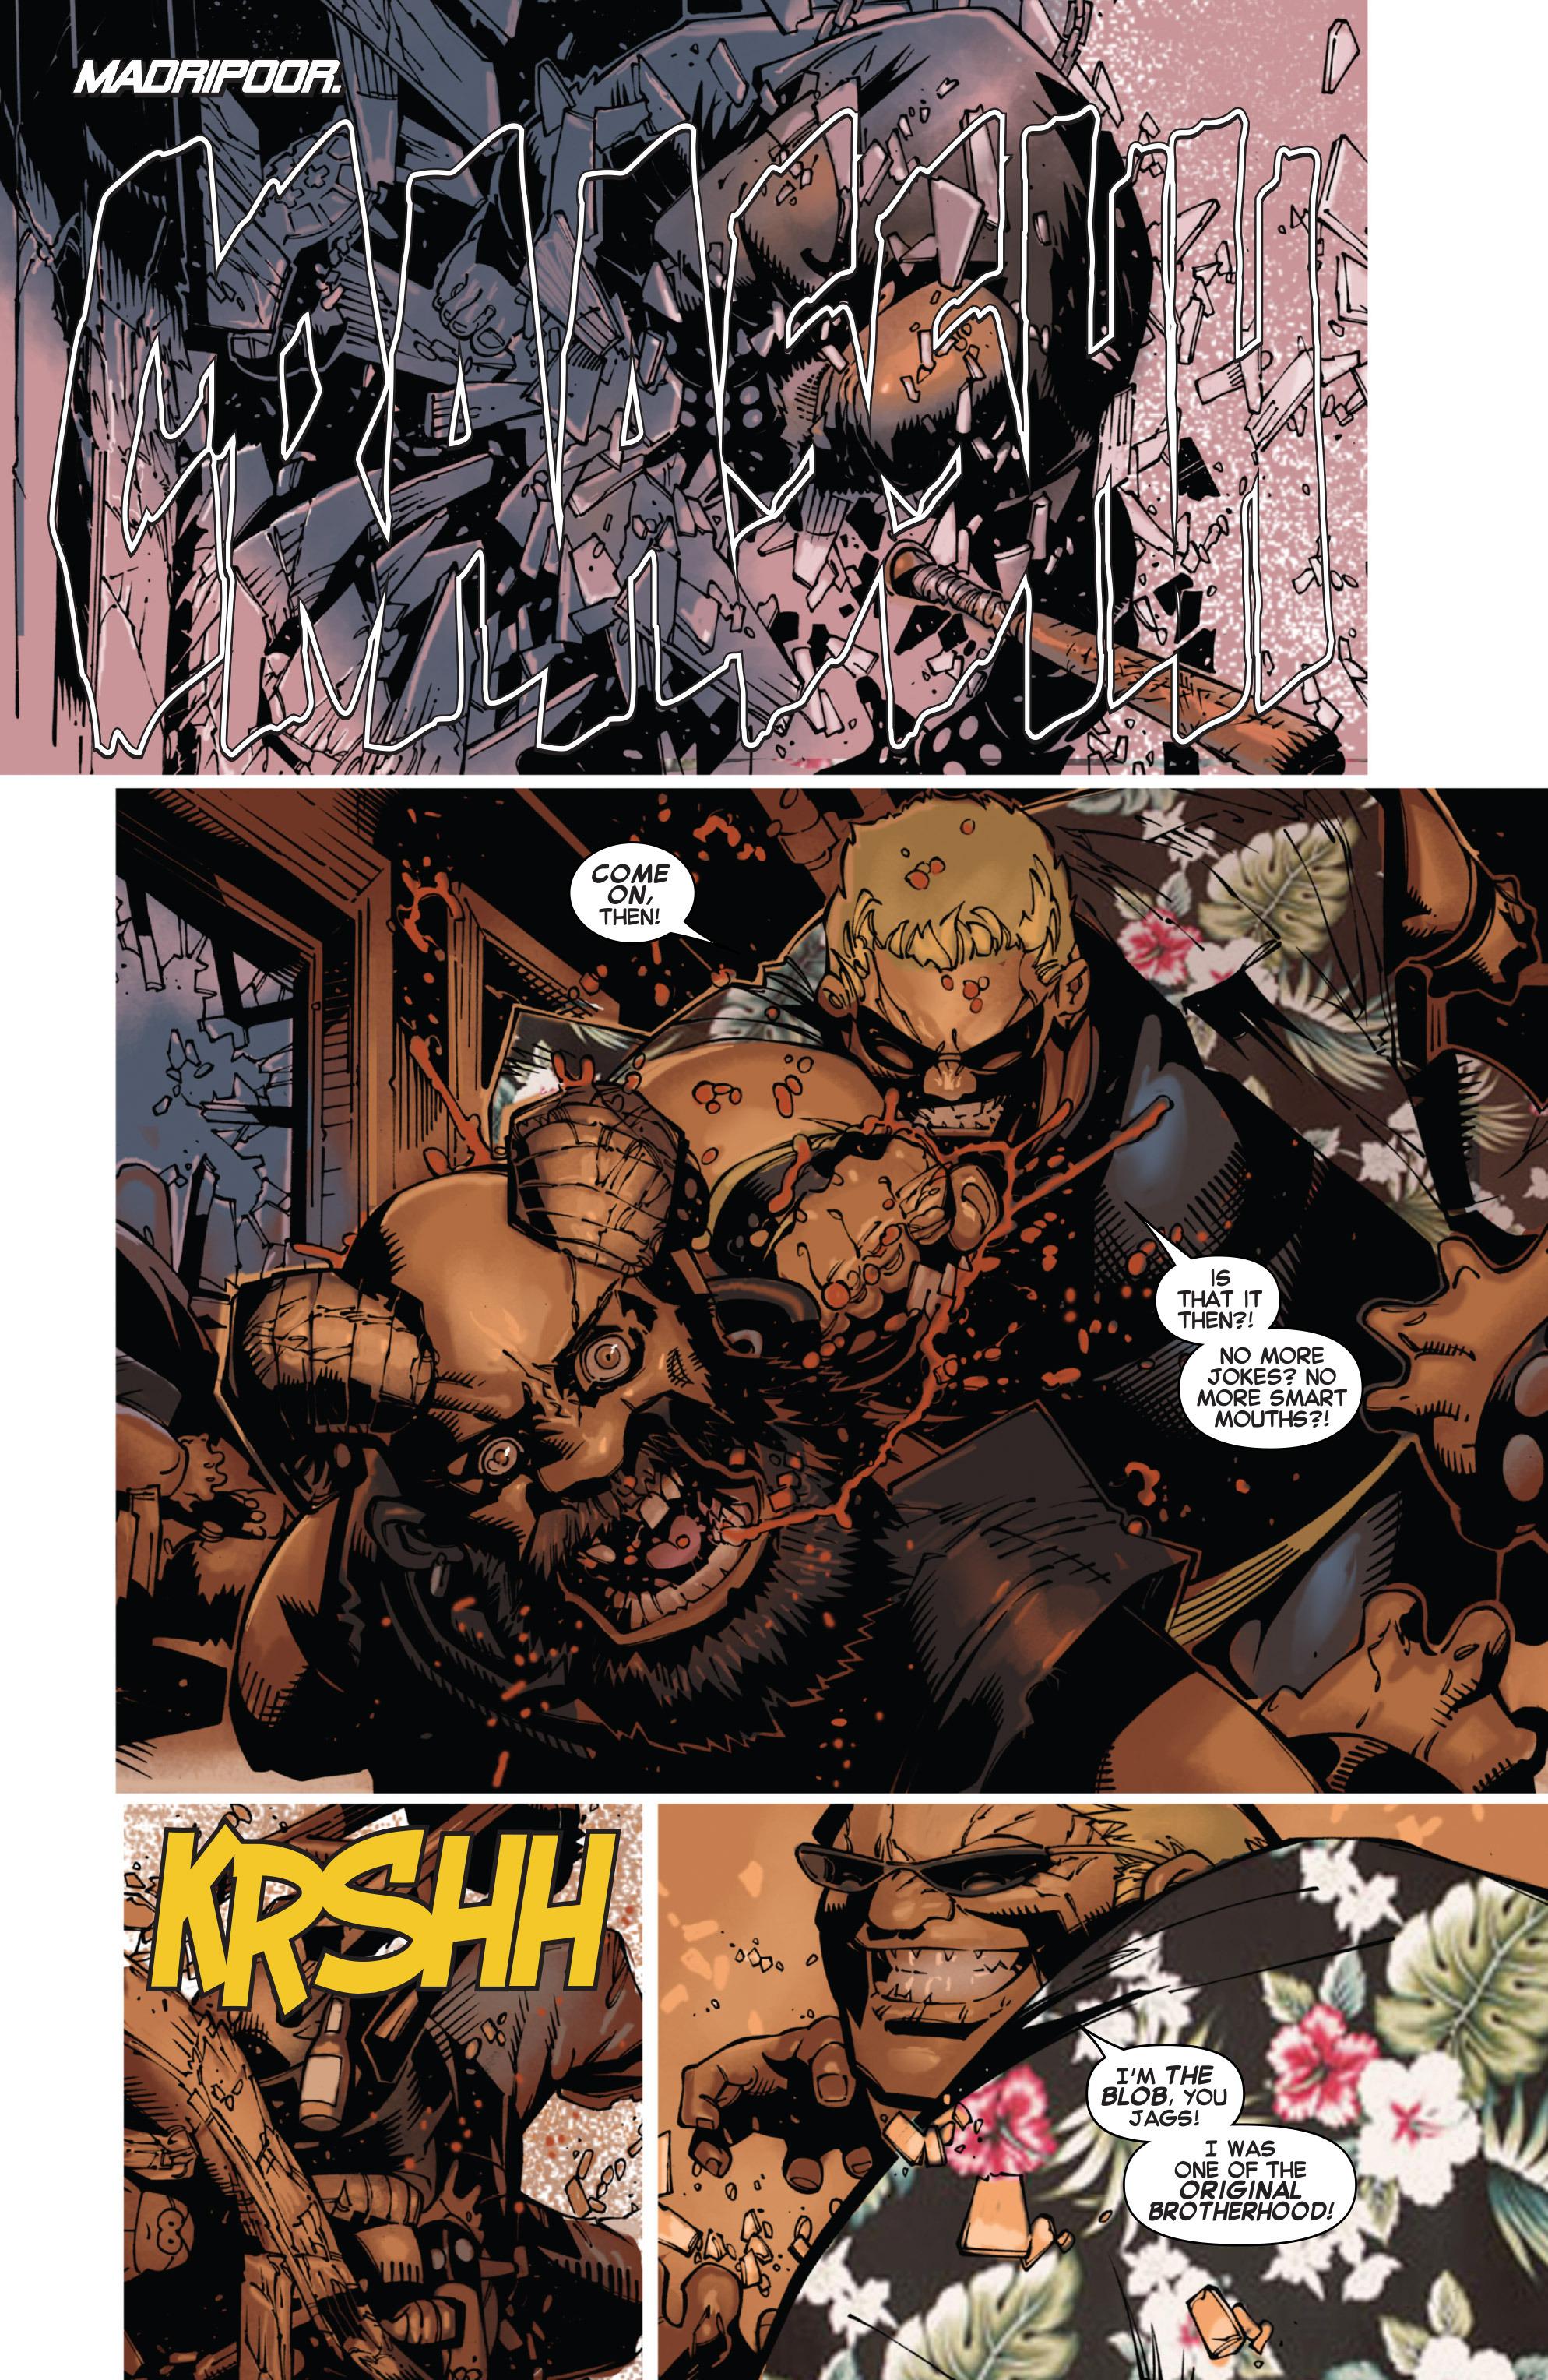 Read online Uncanny X-Men (2013) comic -  Issue # _TPB 4 - vs. S.H.I.E.L.D - 48